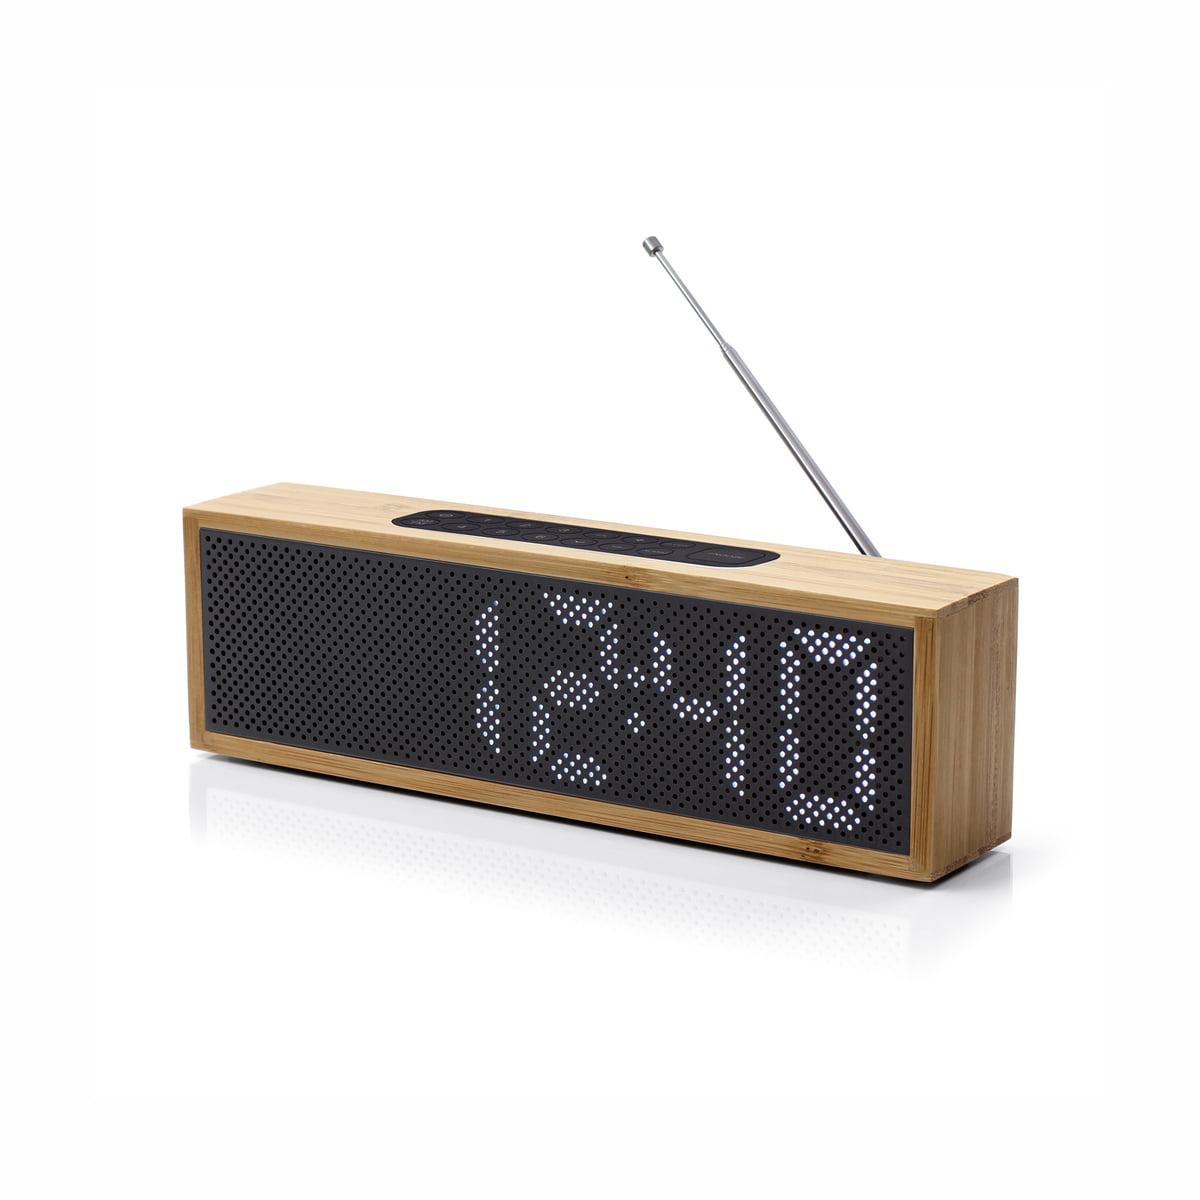 Lexon - Titanium Radio-Wecker, schwarz / Bambus   Dekoration > Uhren > Wecker   Bambus natur   Bambus -  abs -  gummi   Lexon